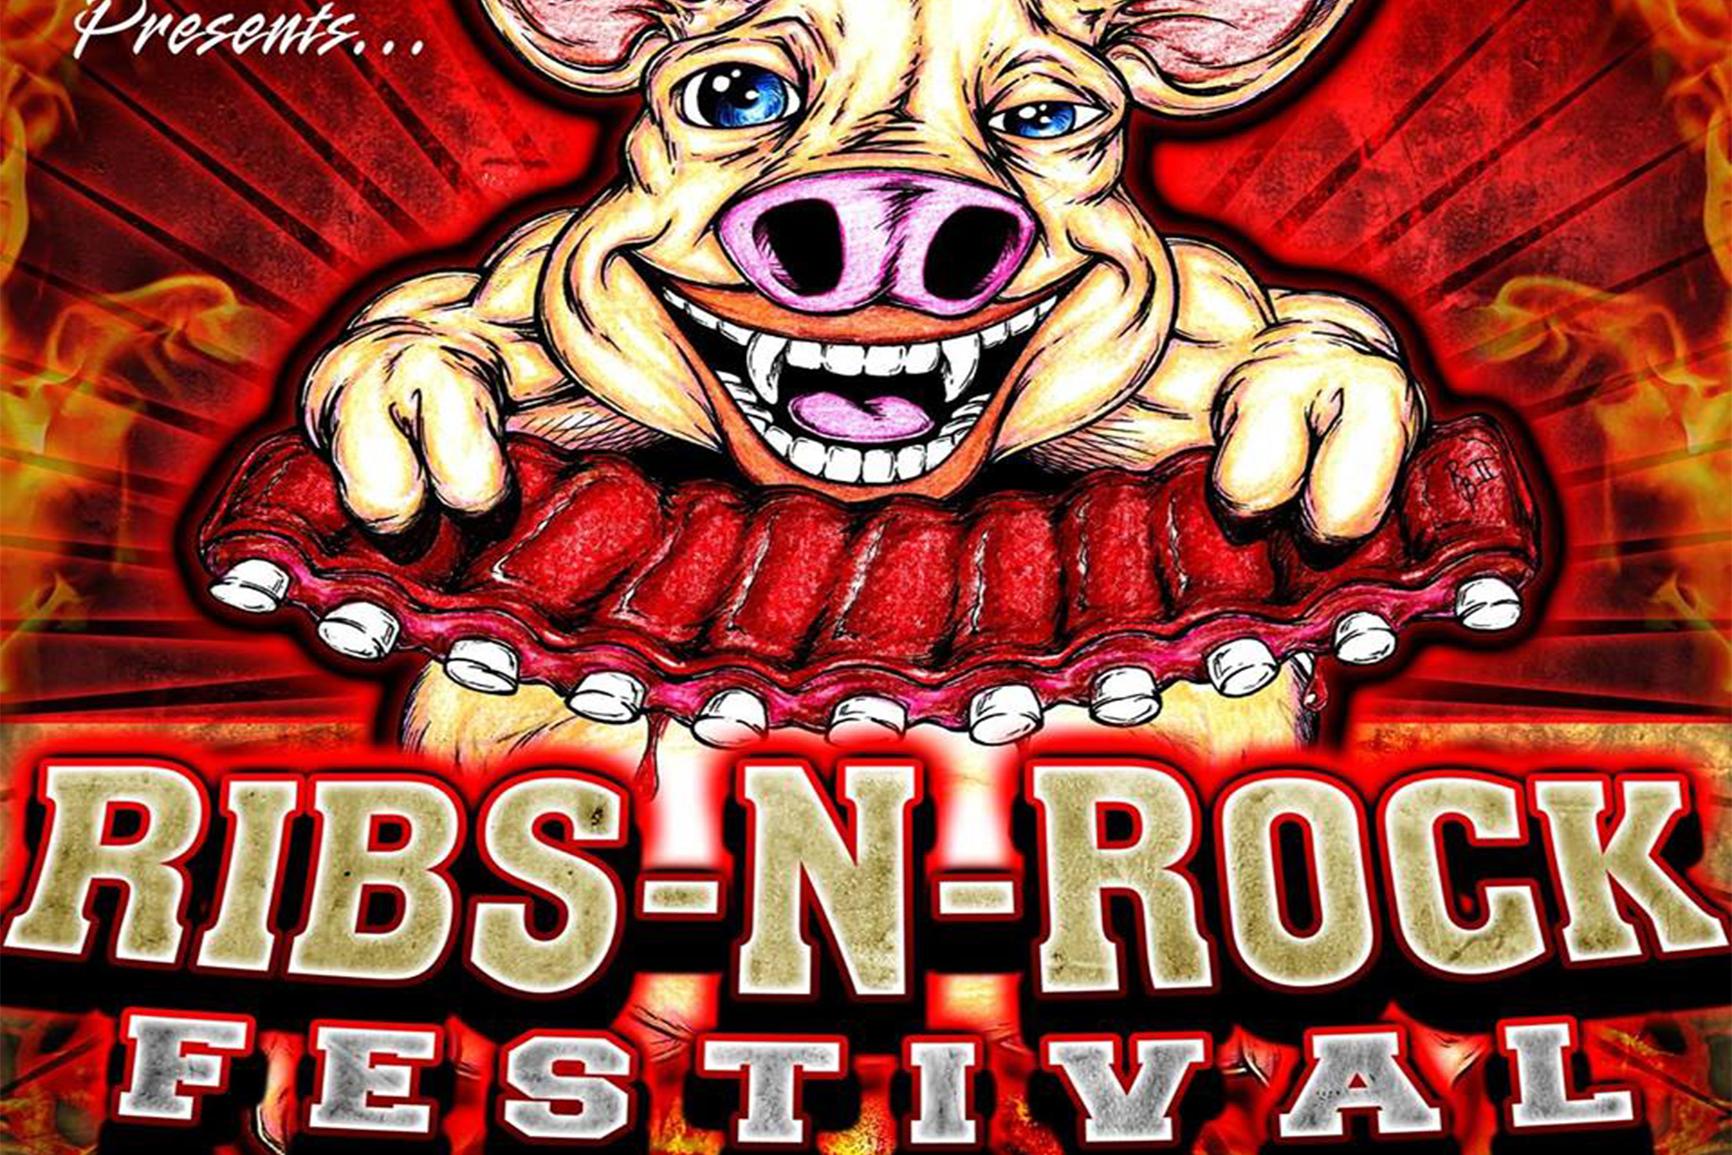 Ribs-n-Rock Festival